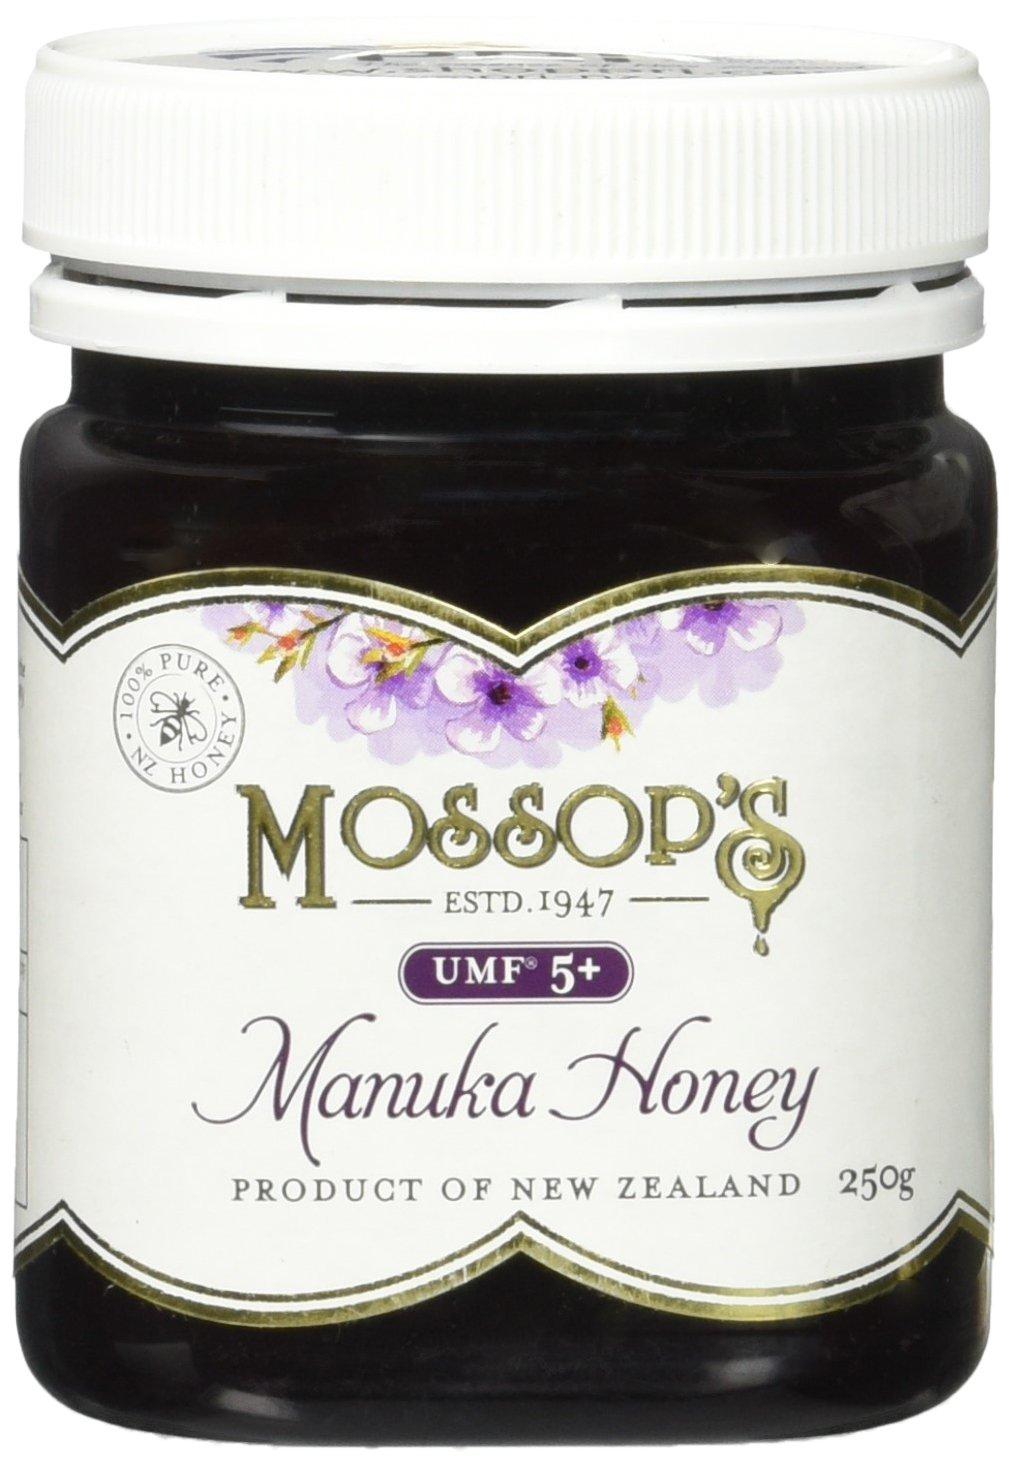 MOSSOPS MANUKA HONEY